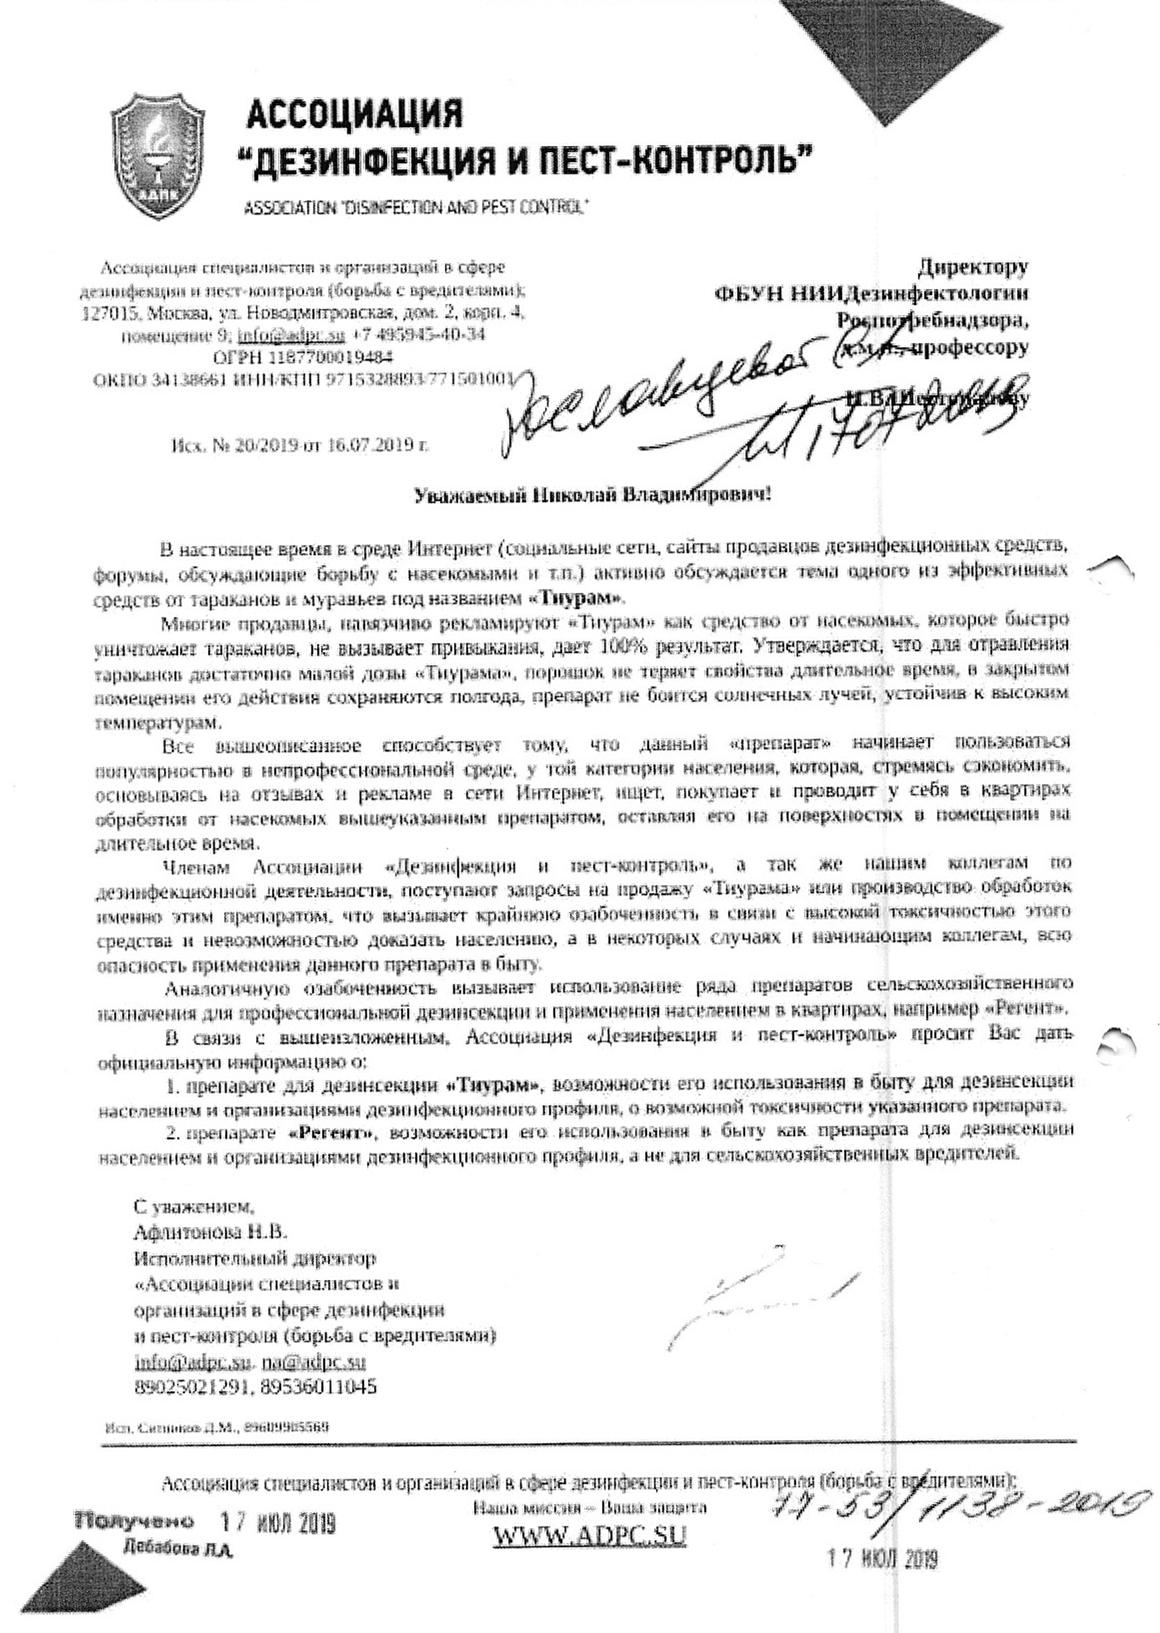 pismo_adpk.png (982 KB)